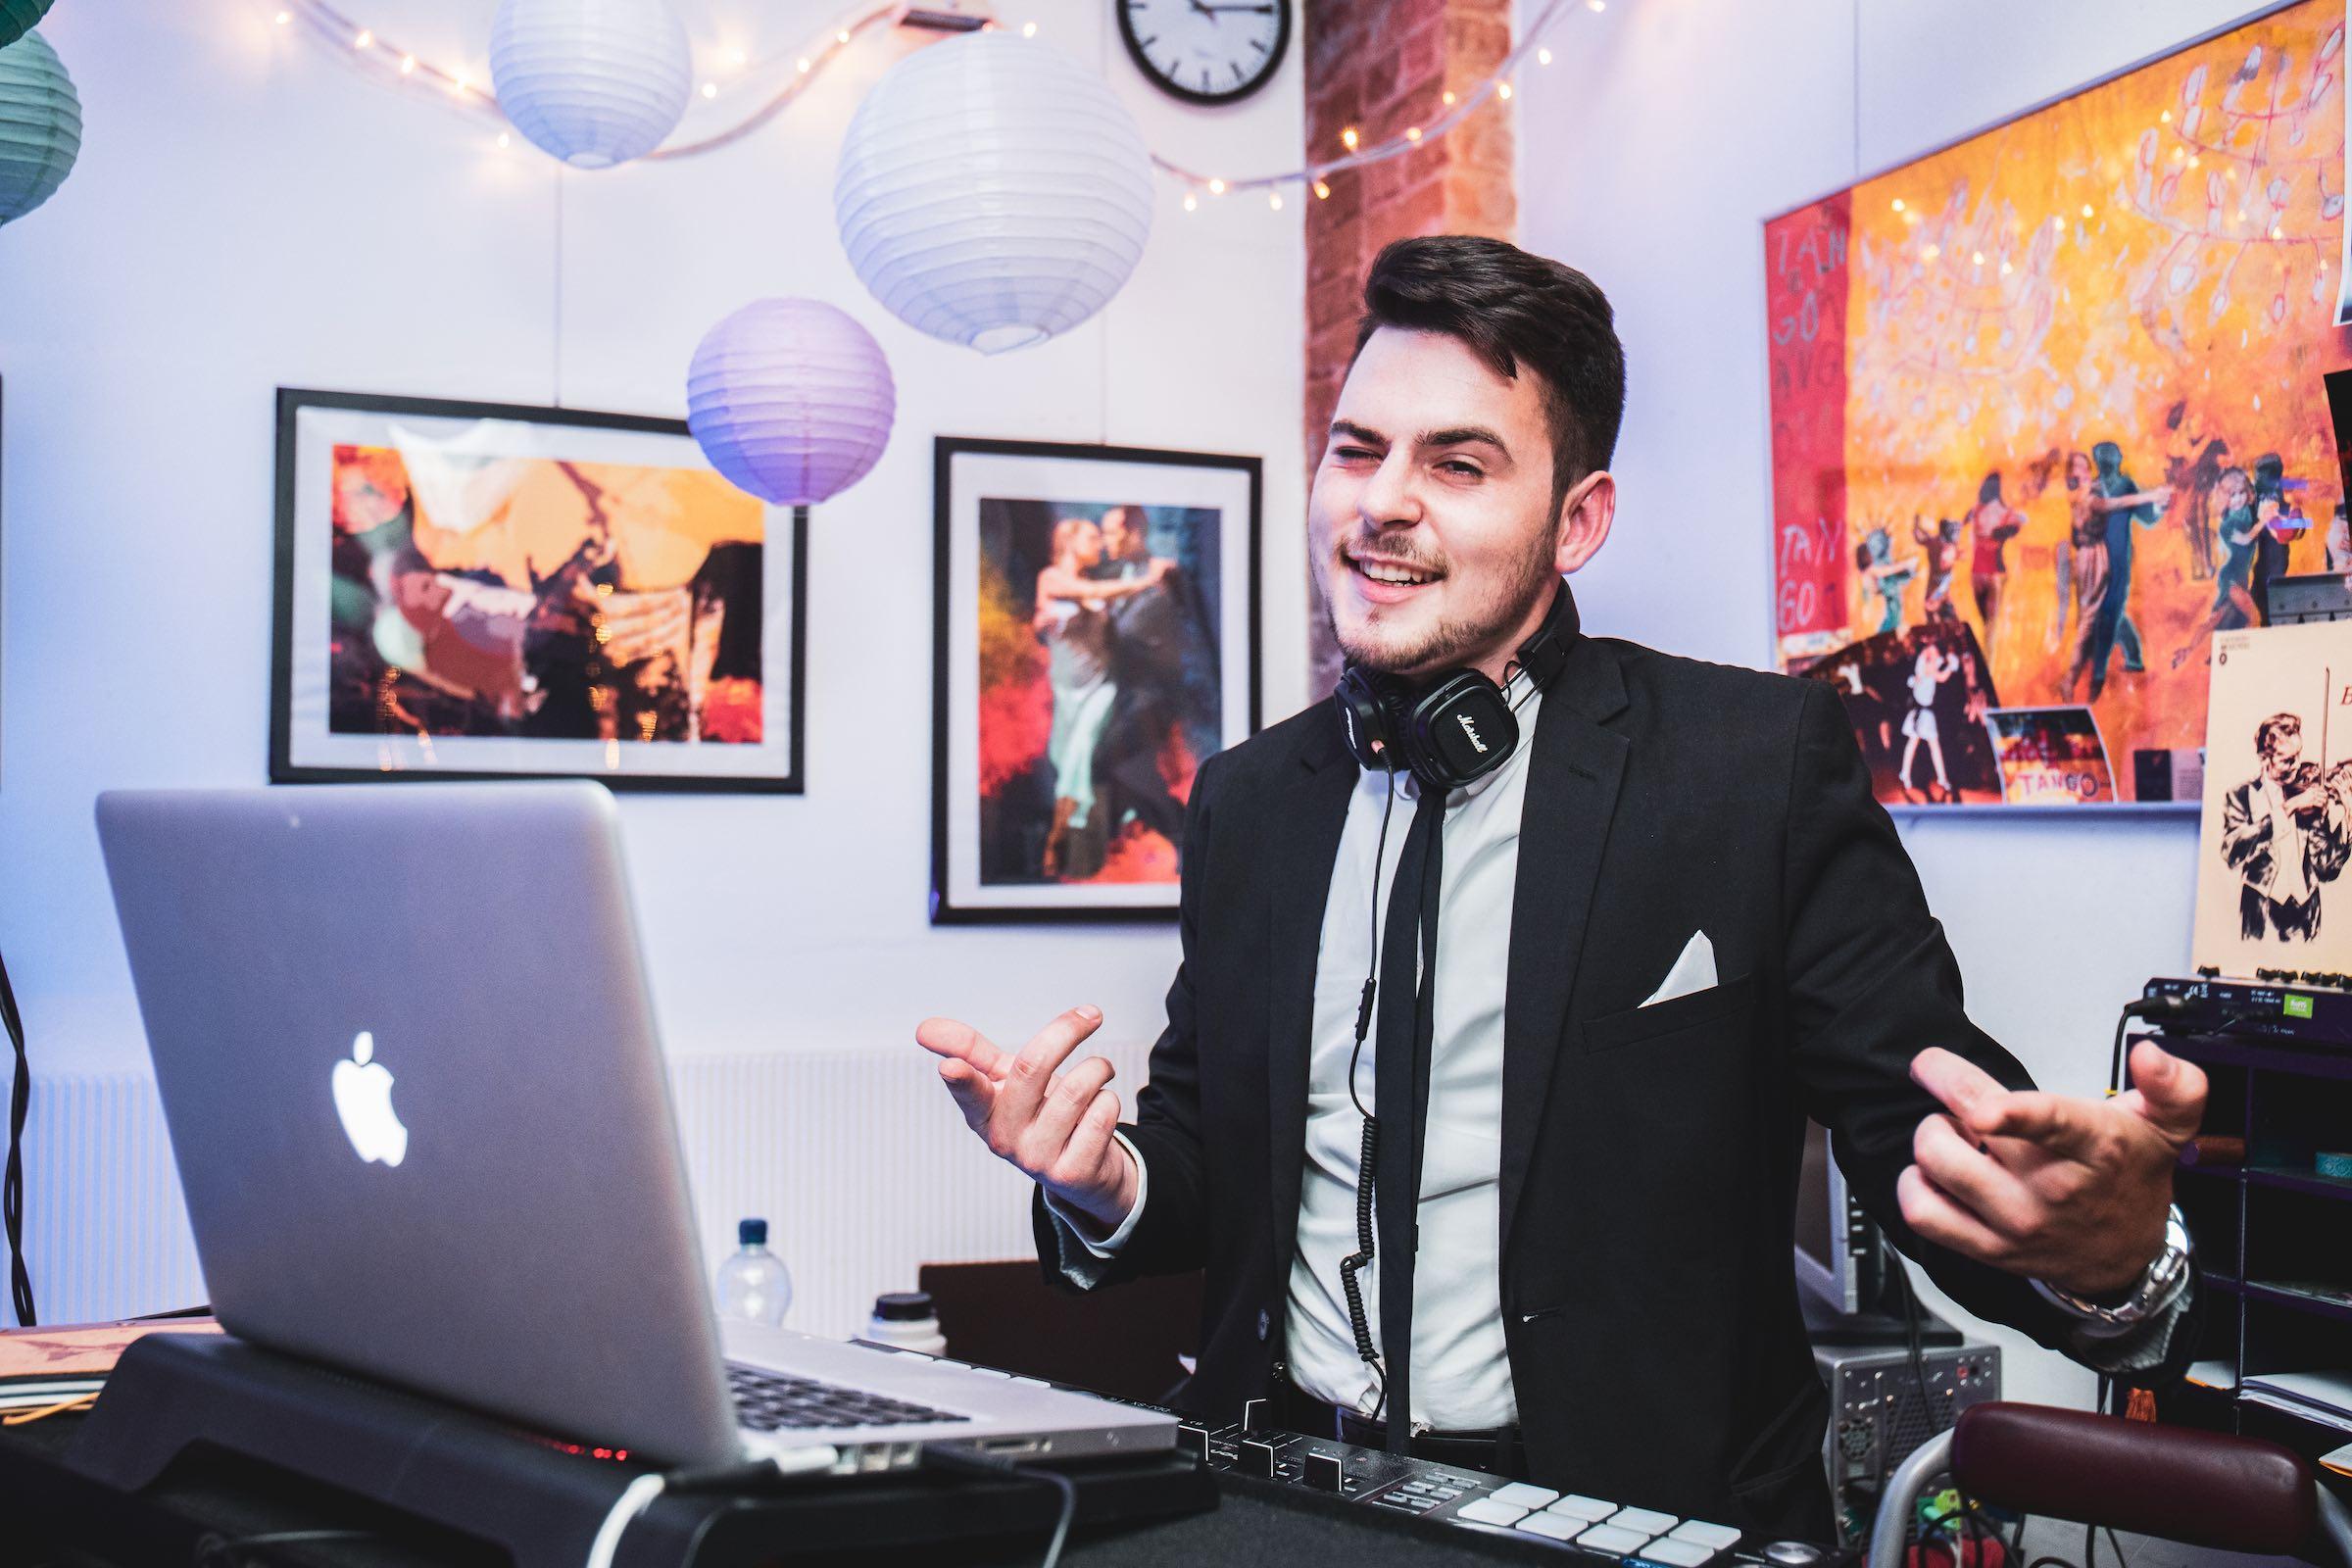 DJ   Hannover   Buchen   Discjockey   Marvin   Feike   DJ   Firmenfeier   DJ   Messe   Event   DJ   Geburtstag   DJ   Service   DJ   Kosten   DJ   Mieten   DJ   Anfragen   DJ   Agentur   Lehmann   Eventservice